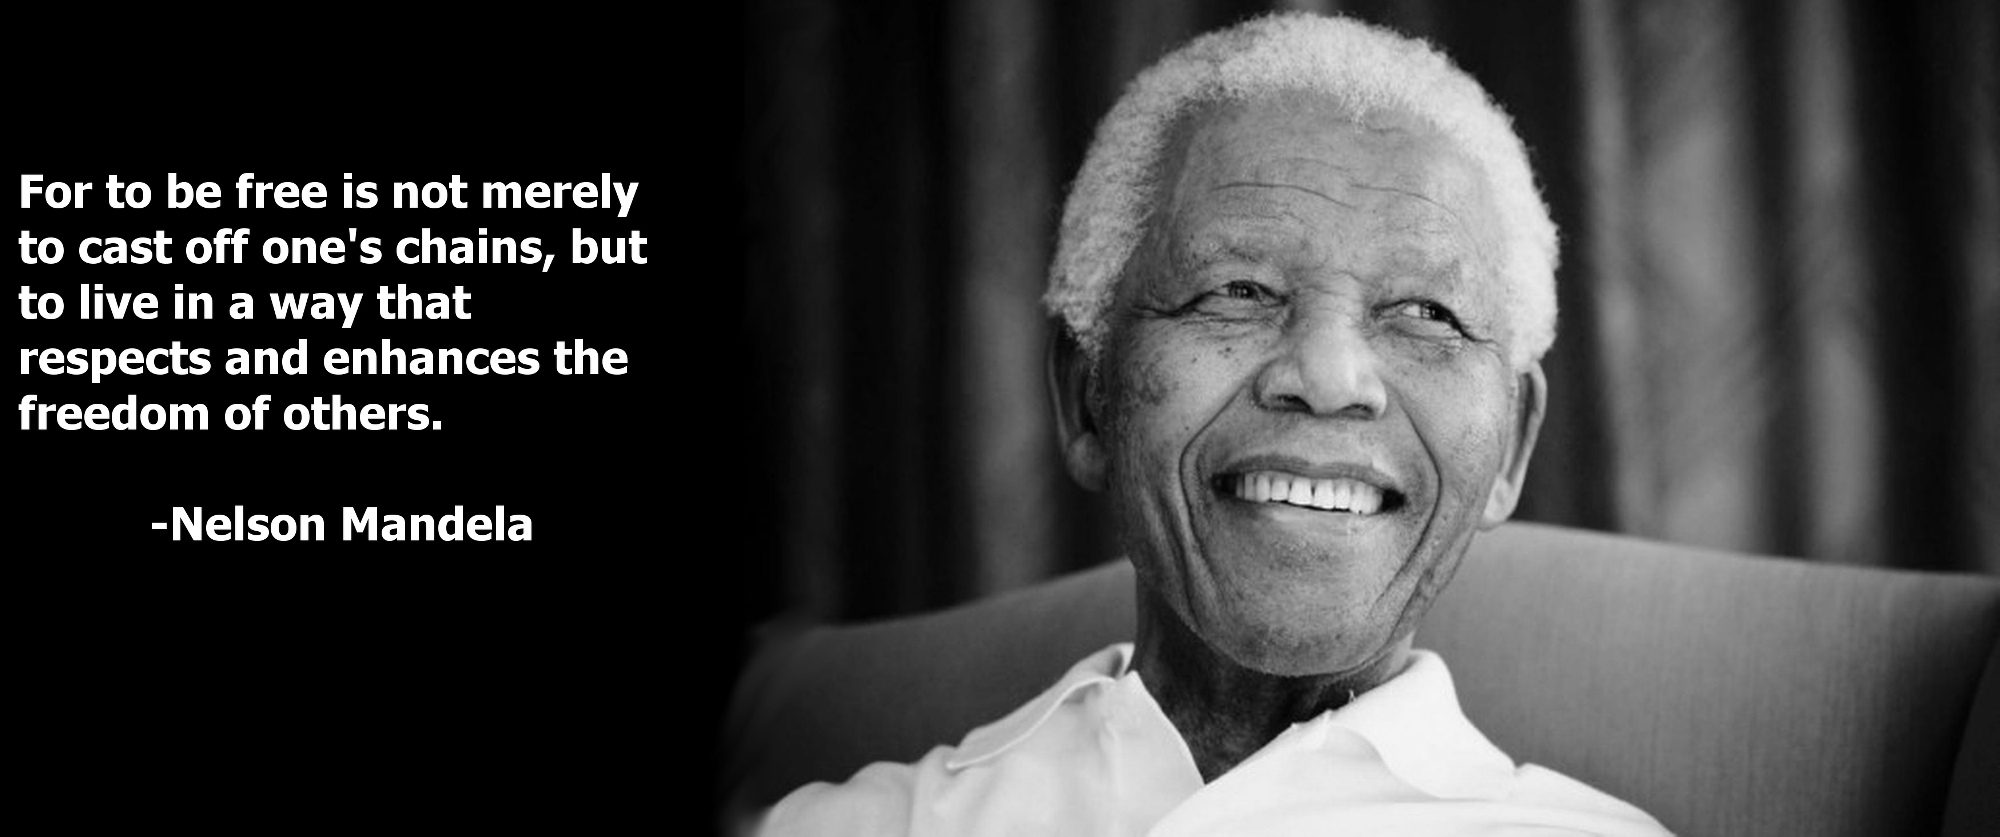 Nelson Mandela Quotes: Friday's Fresh Five! (7/4/14)